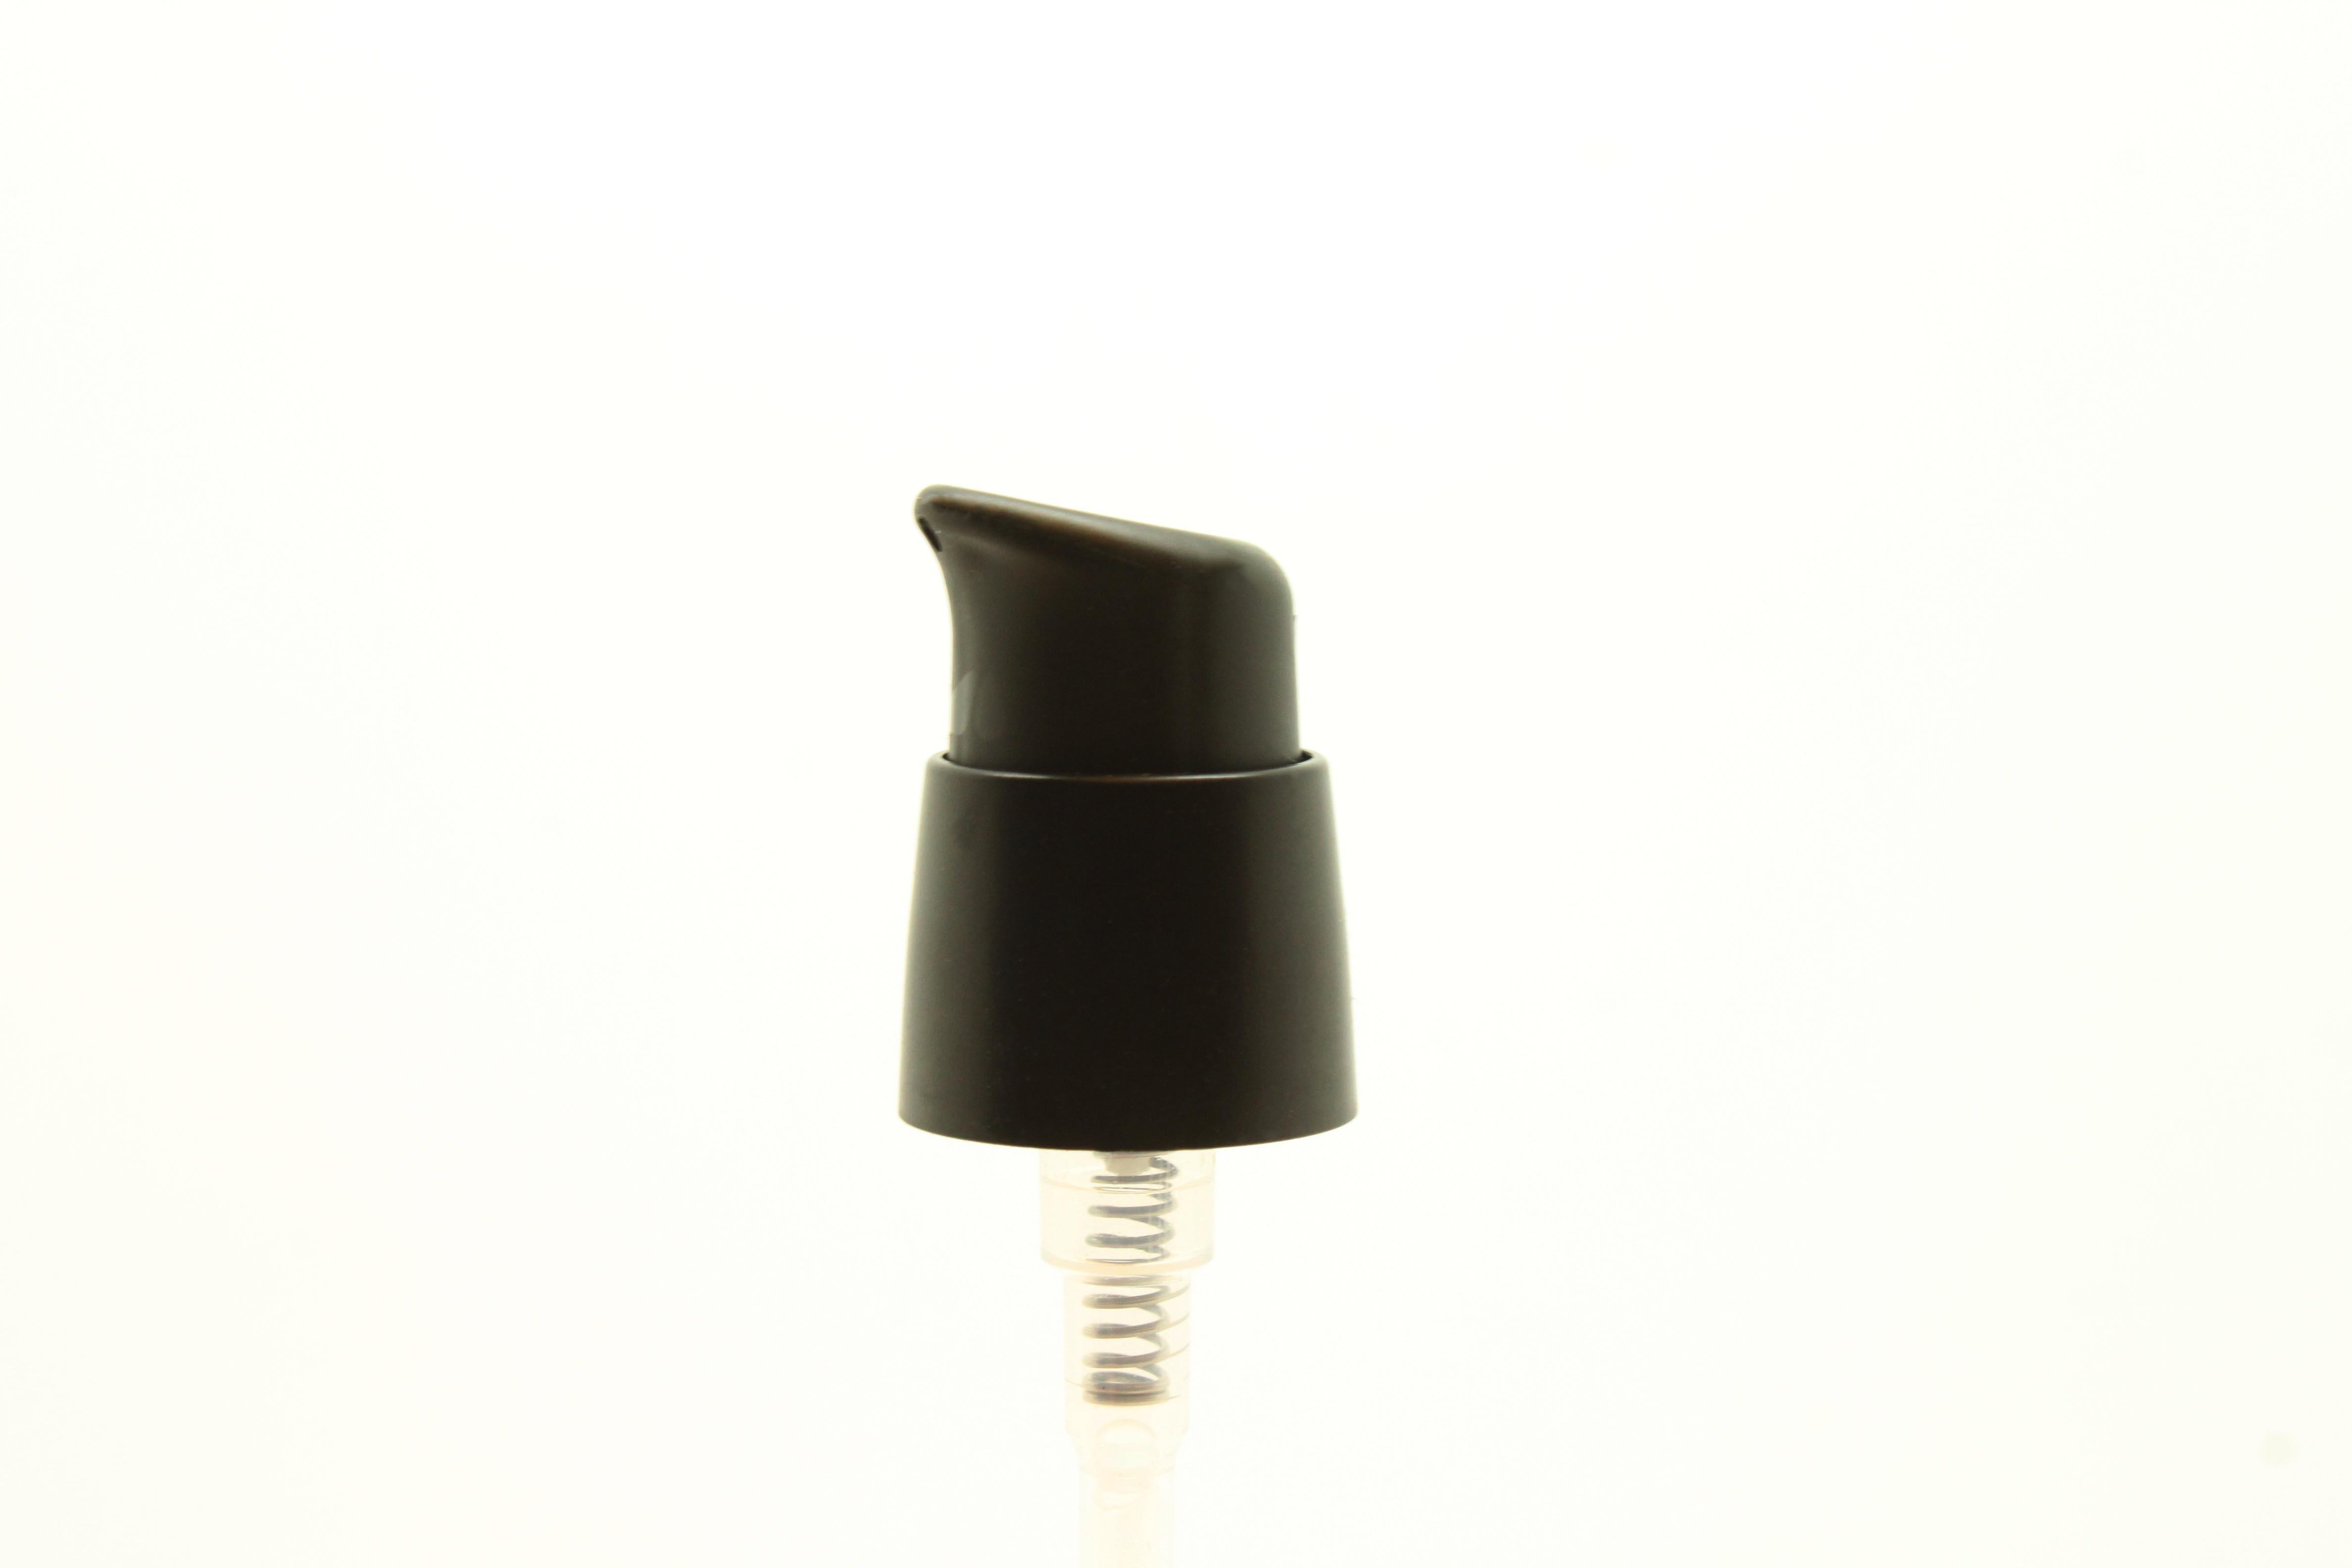 18mm 400 TREATMENT PUMP BLACK